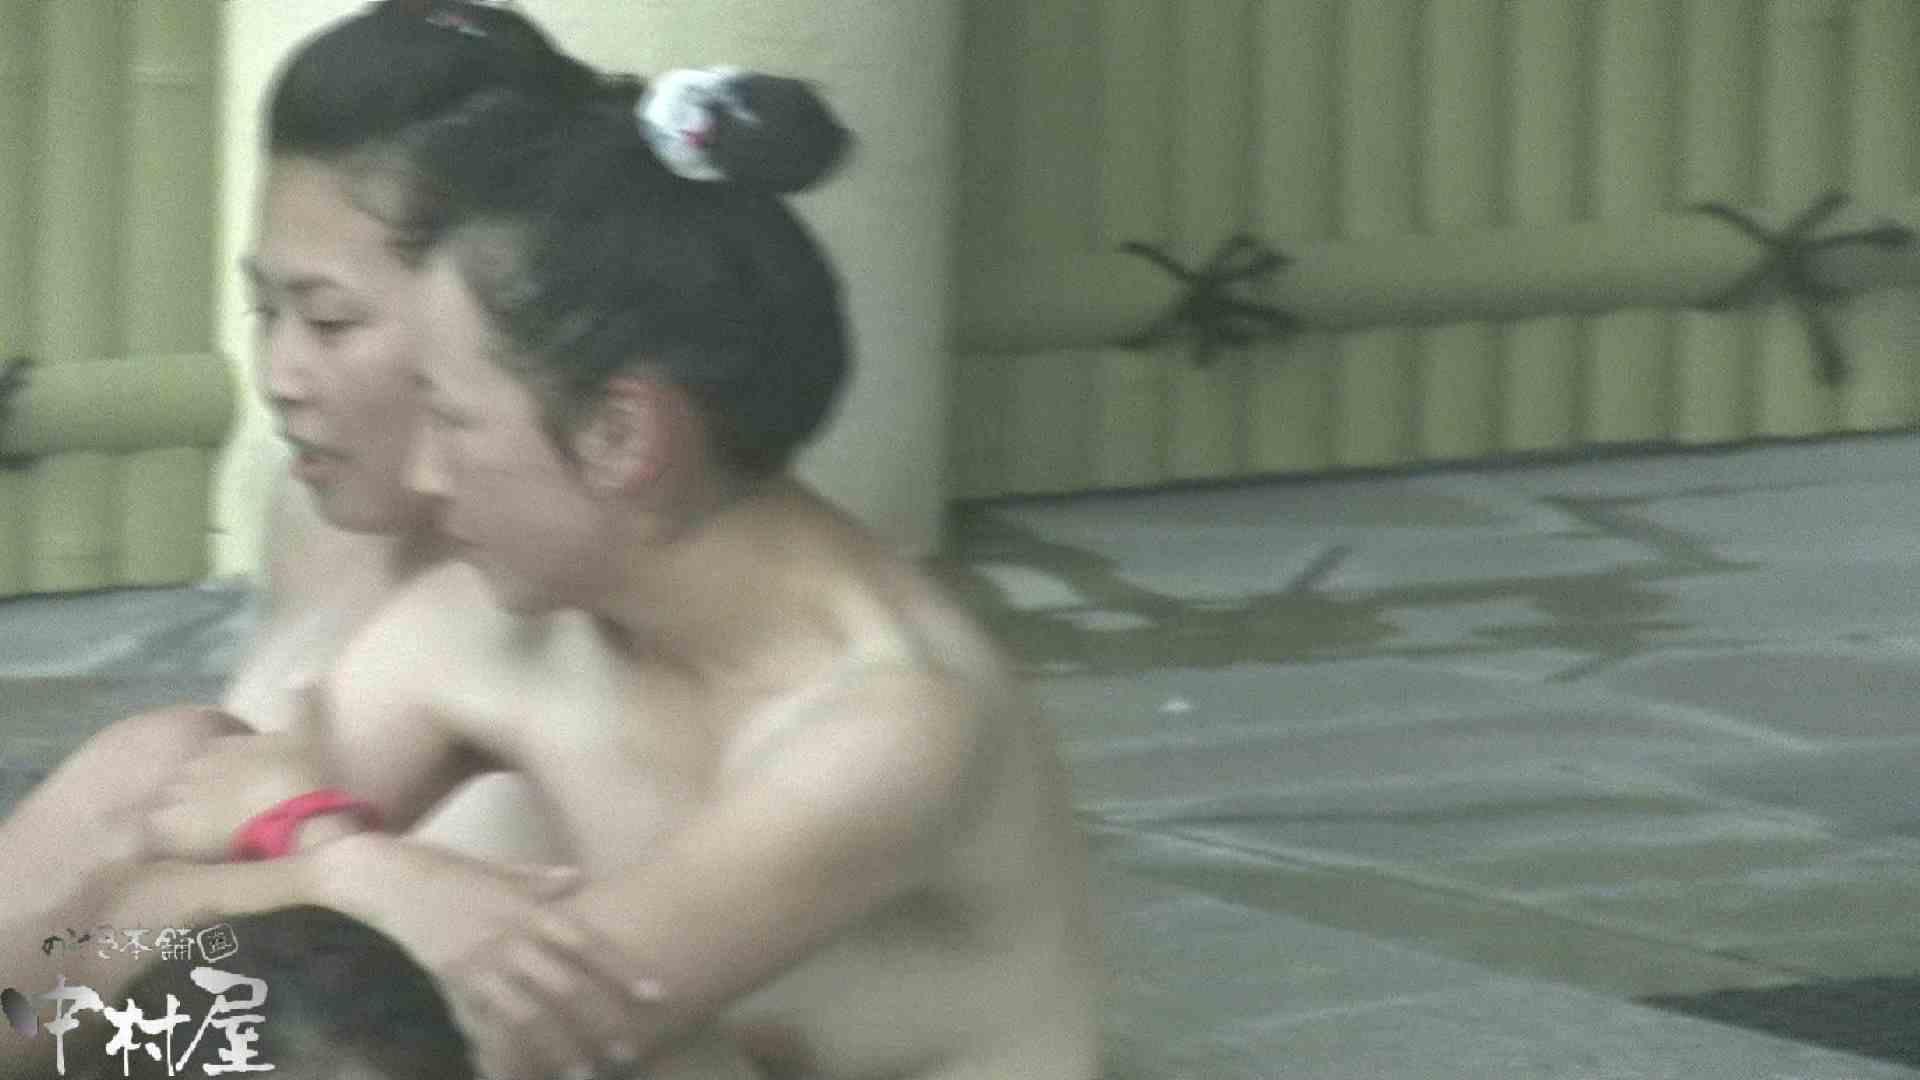 Aquaな露天風呂Vol.911 0 | 0  81連発 71